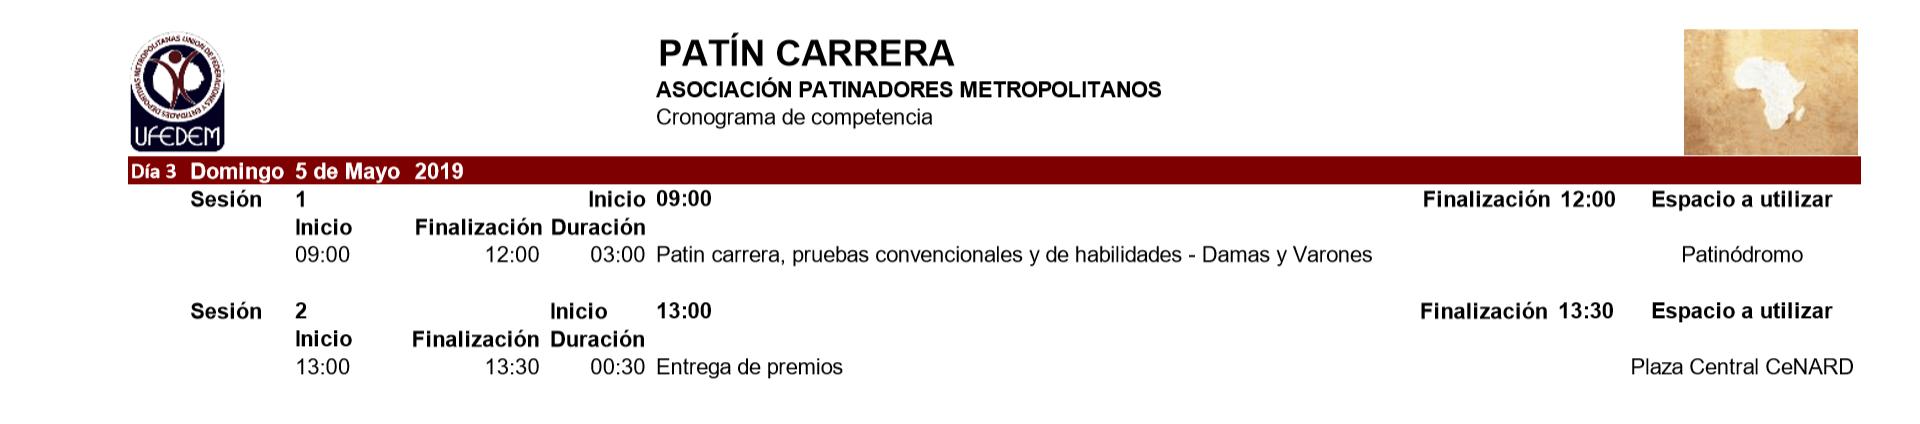 Patín Carrera 2.1 - Cronograma